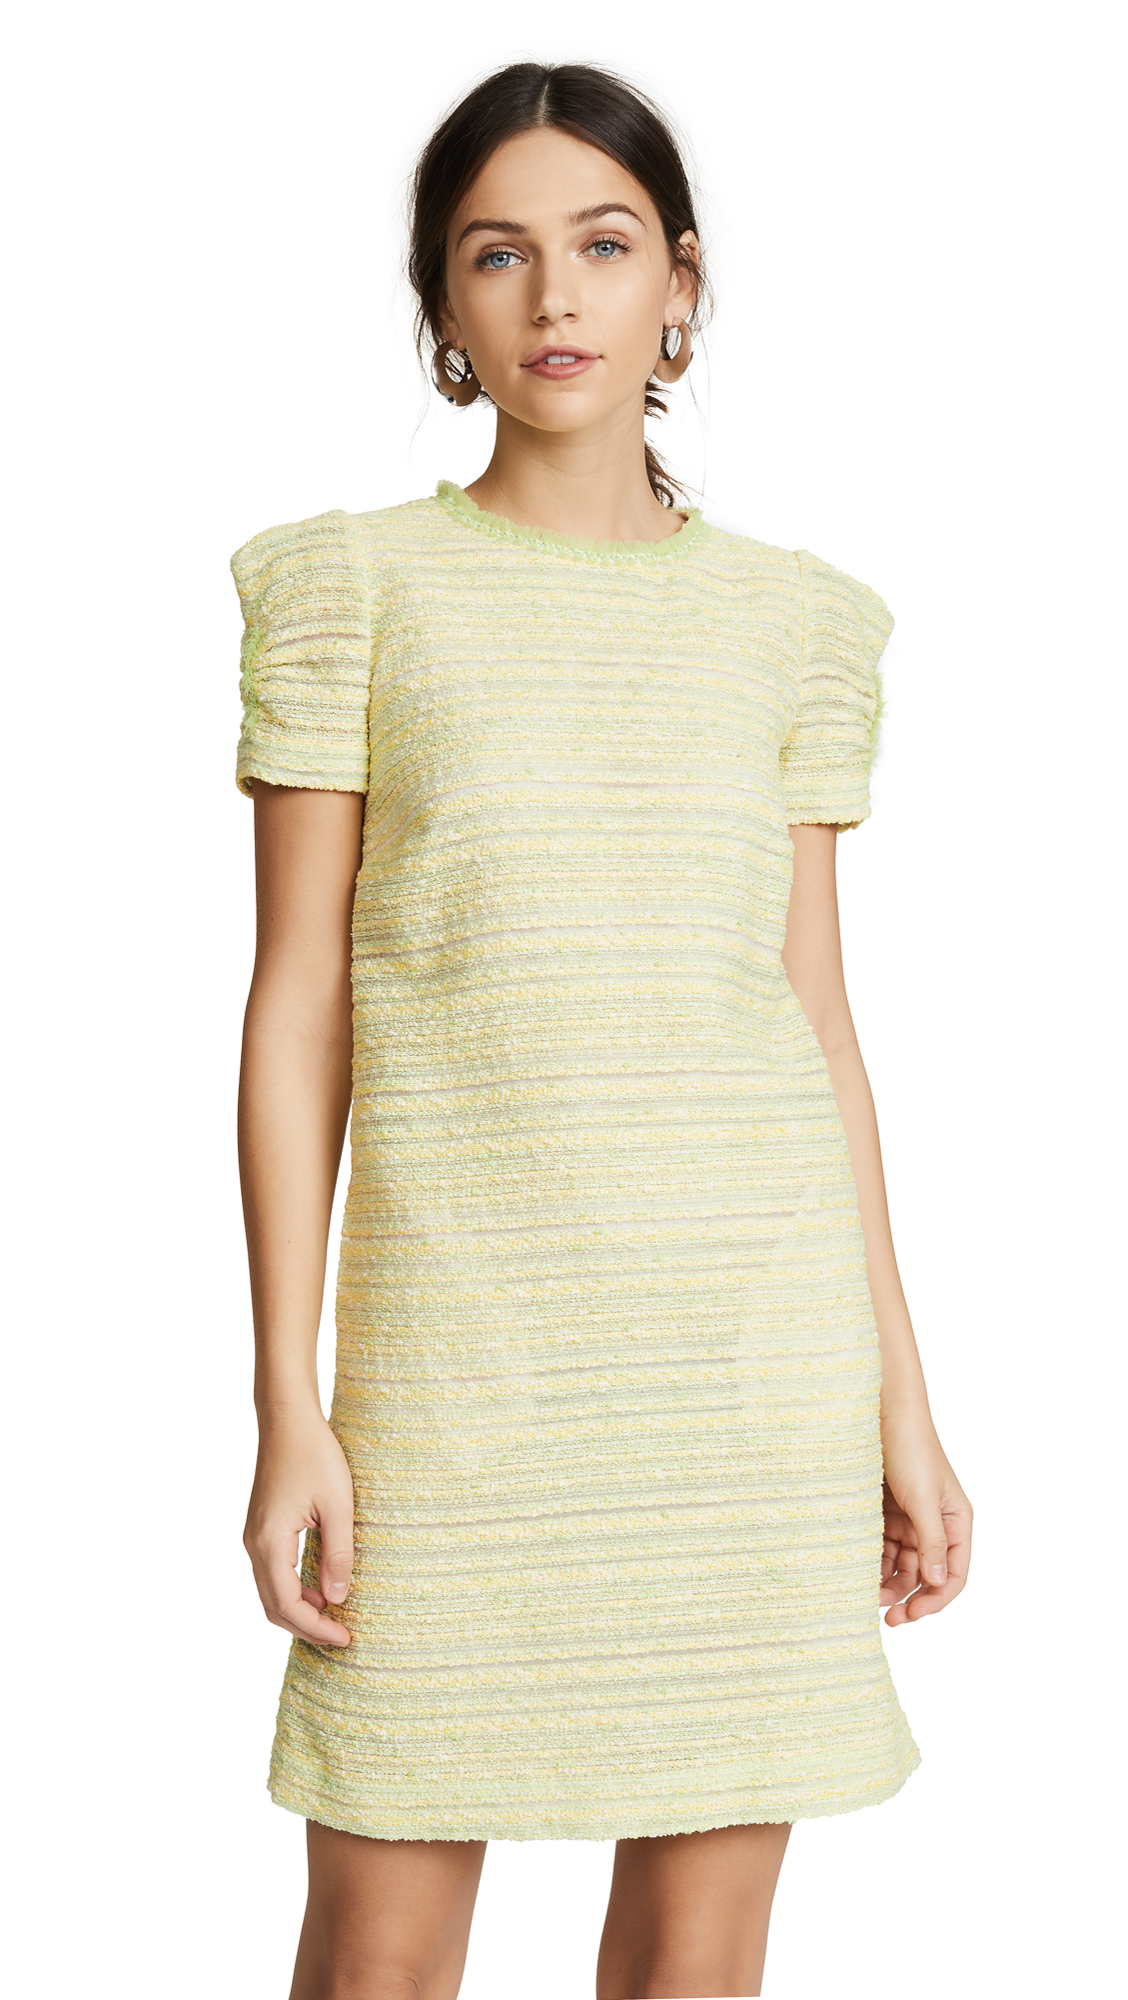 Boutique Moschino Tweed Short Sleeve Dress